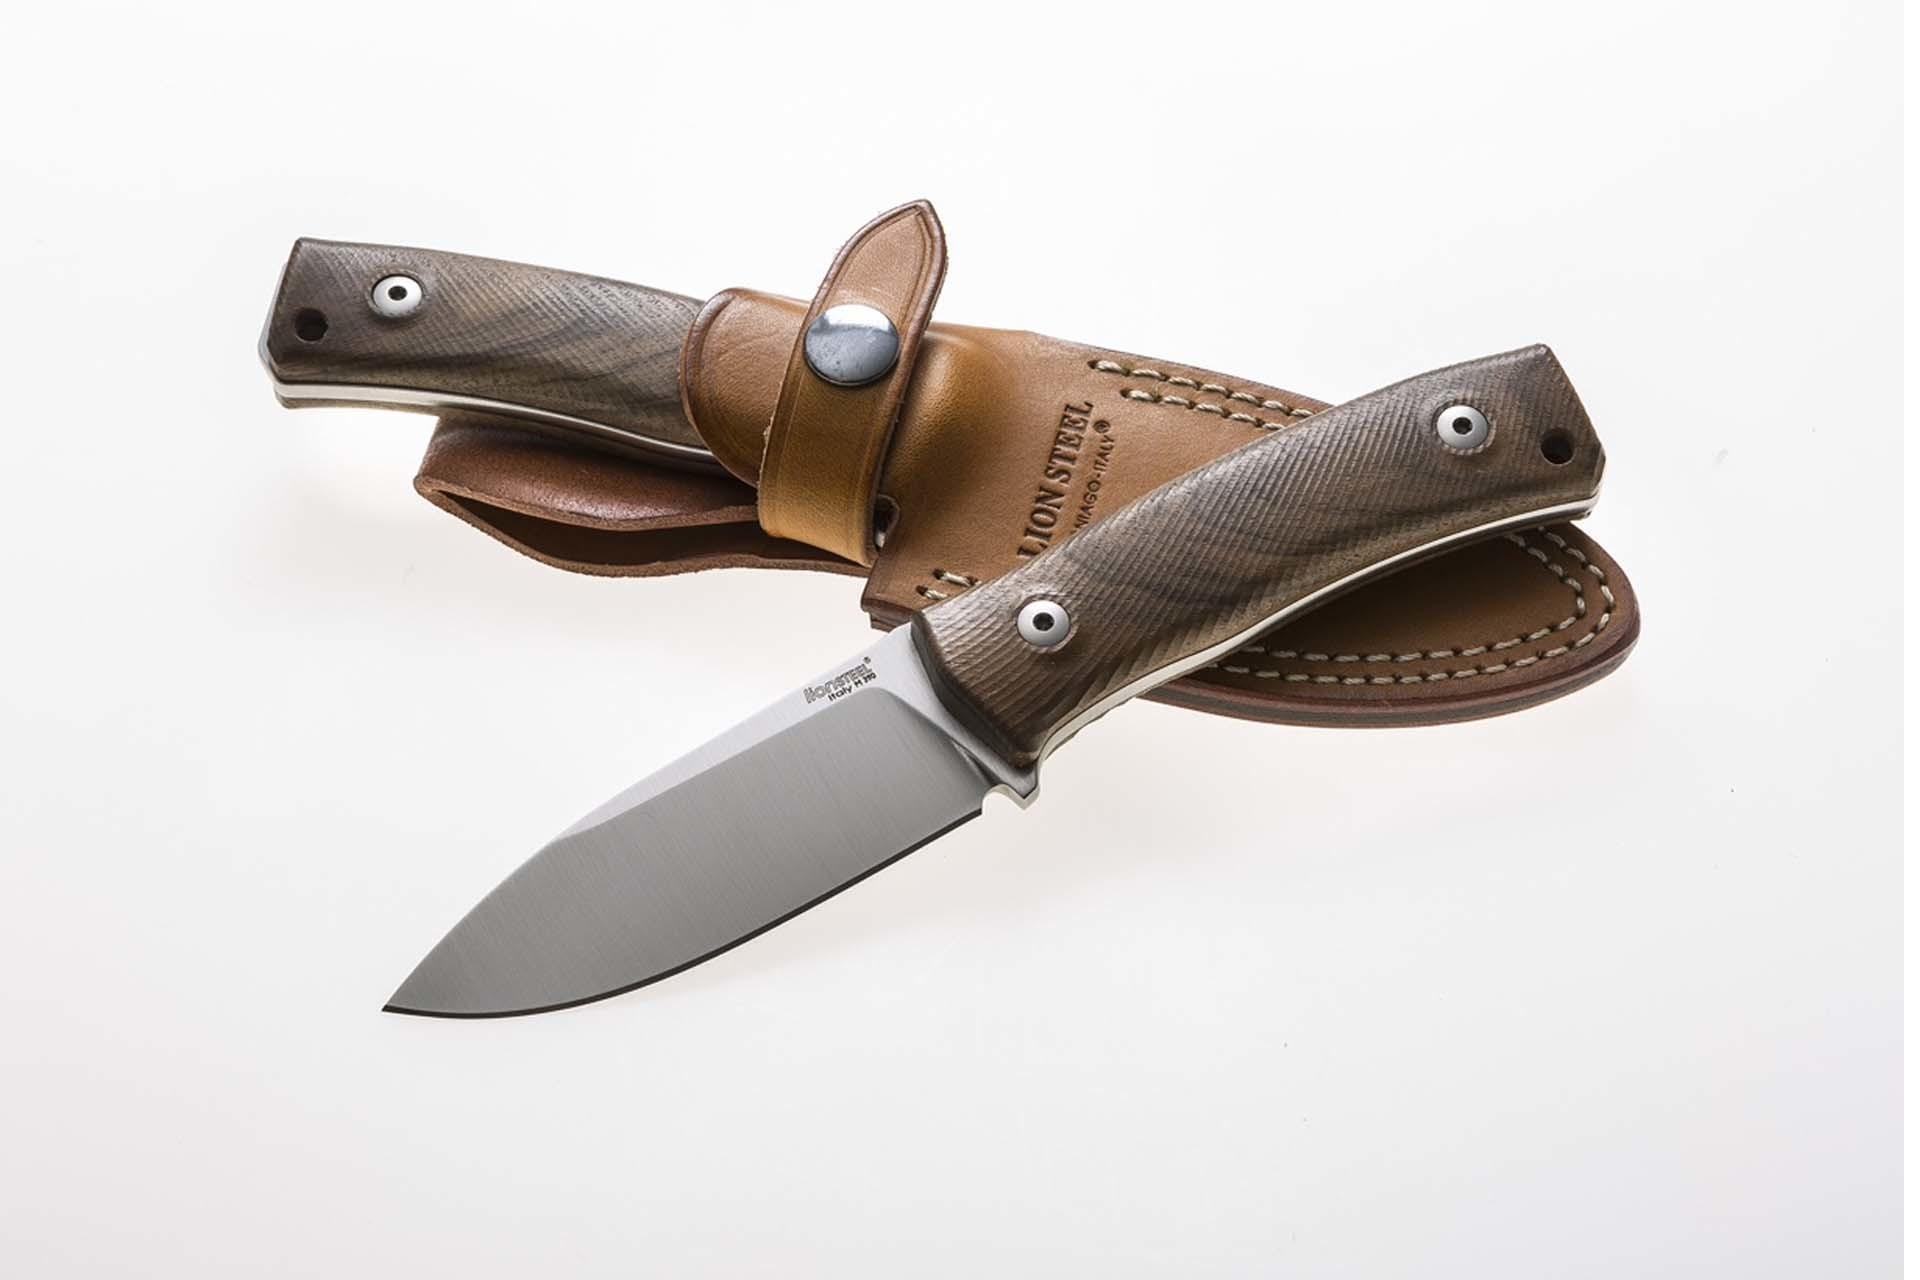 Фото 4 - Нож Lionsteel M4 WN, сталь Bhler M390, рукоять ореховое дерево от Lion Steel